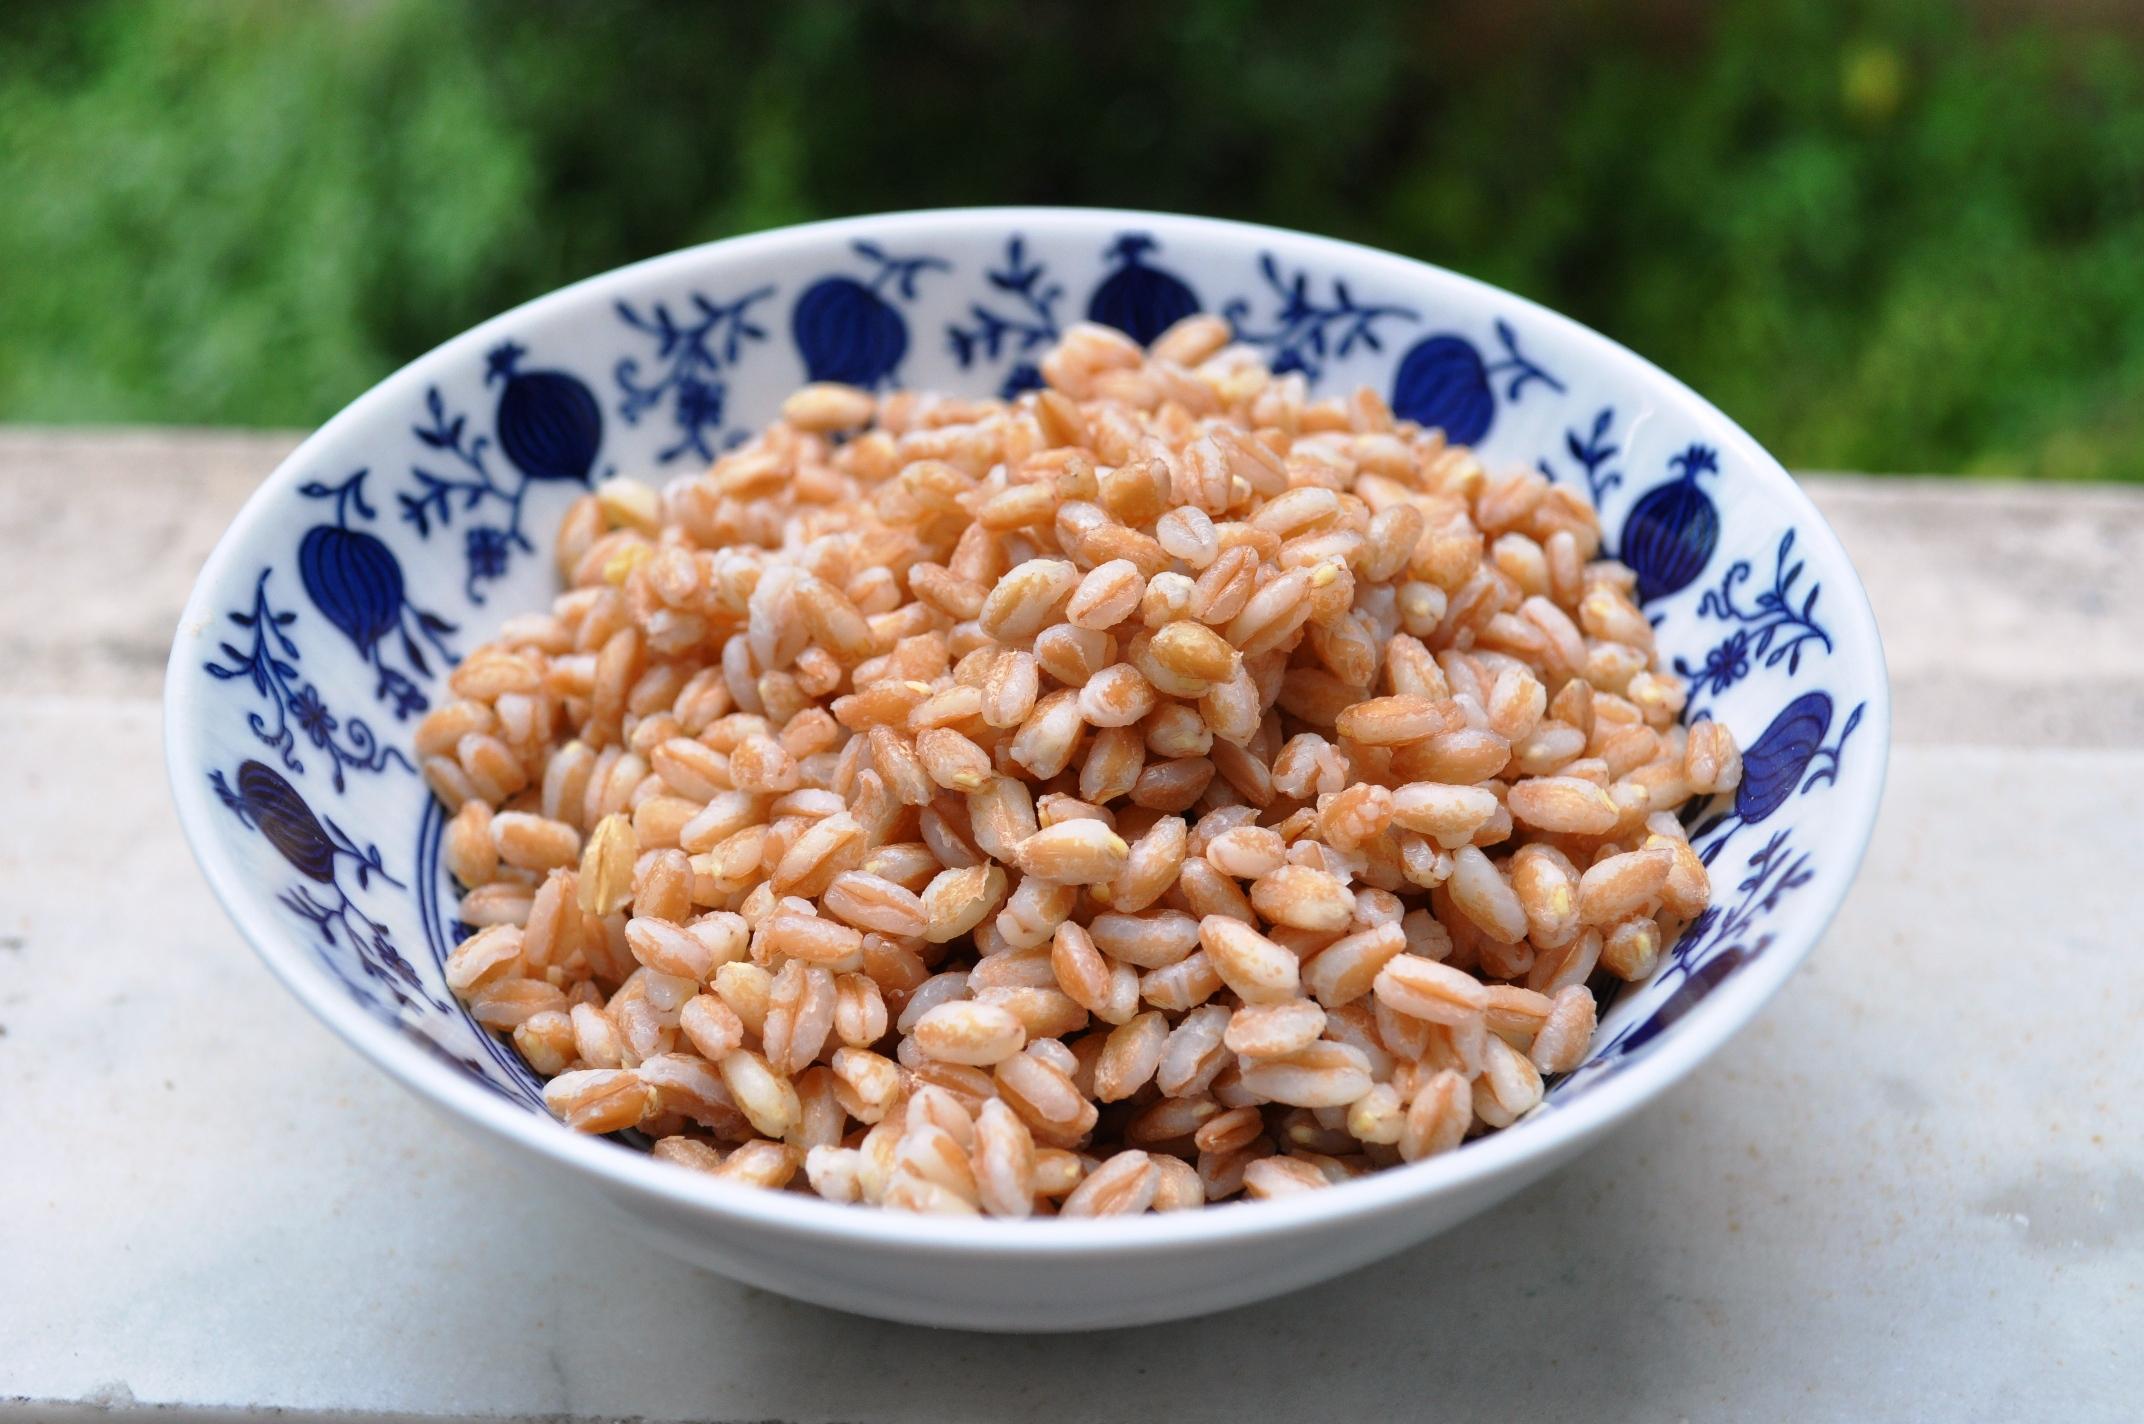 Cooked farro